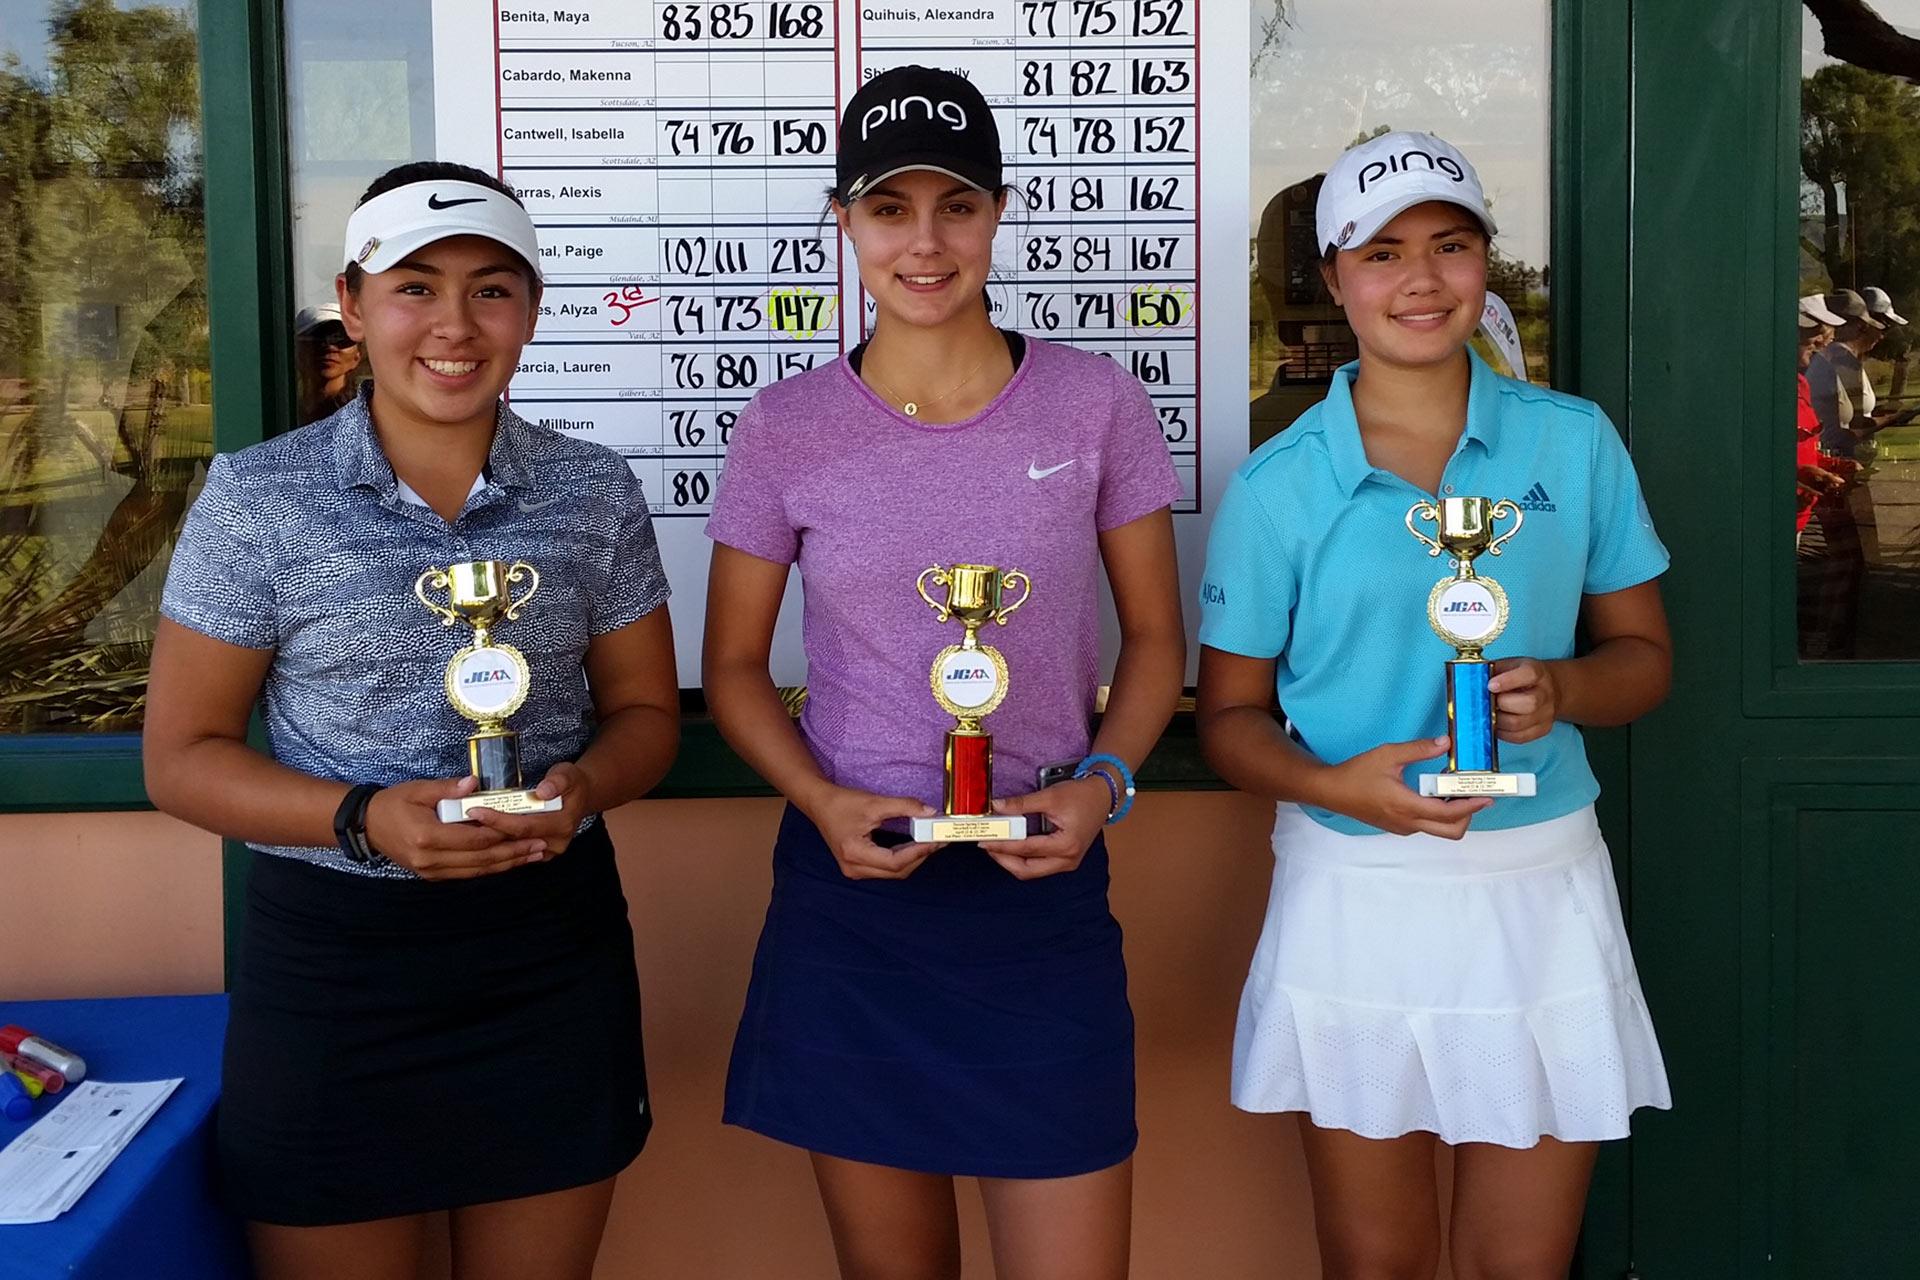 left to right: Alyza Flores, Breyana Matthews, Ashley Menne